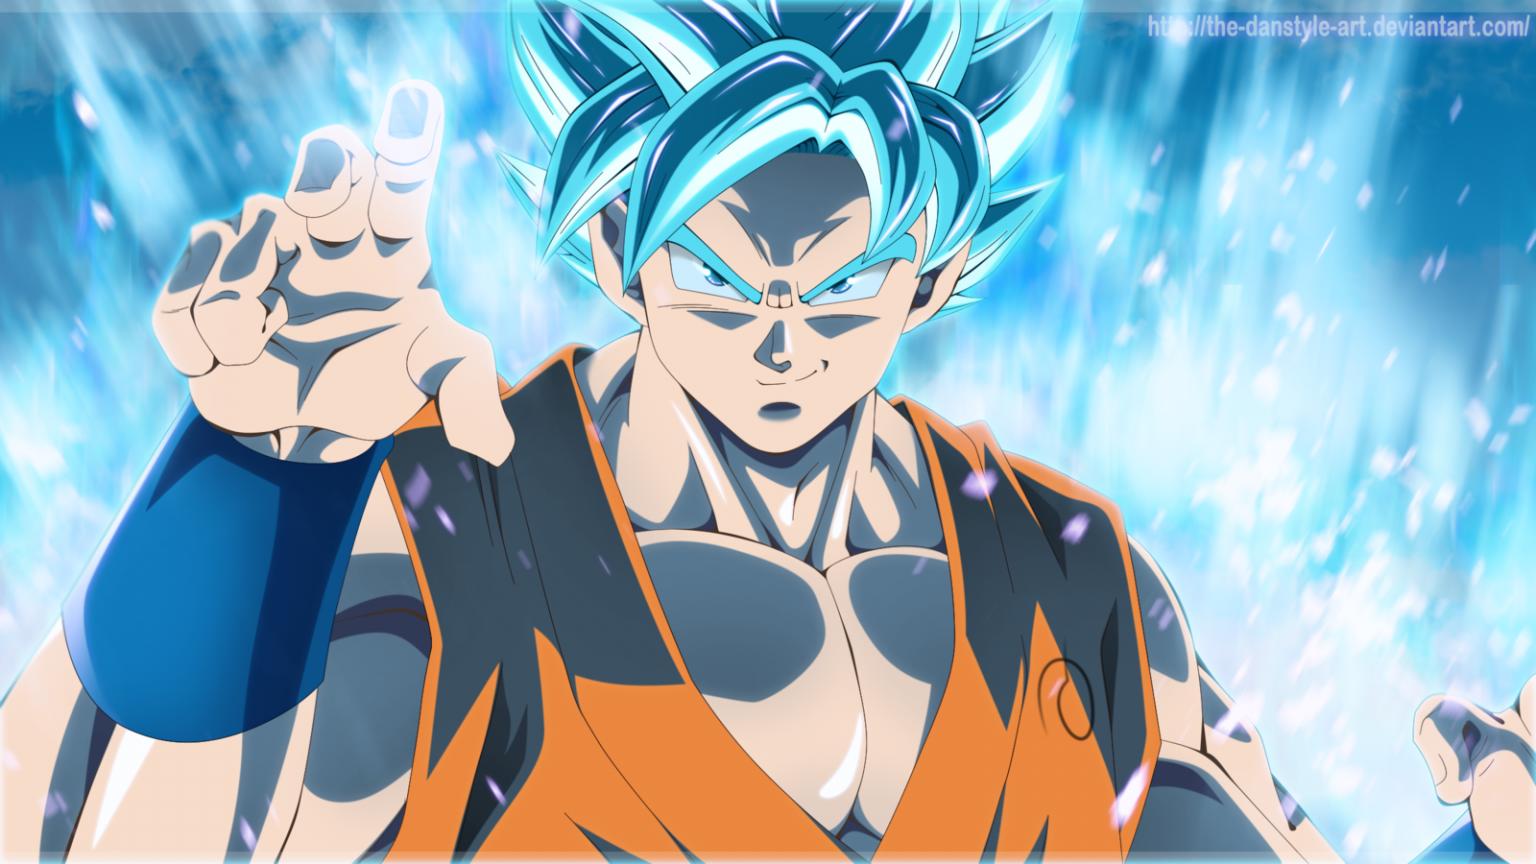 Free Download Goku Super Saiyan Blue Wallpaper Hd 1600x900 For